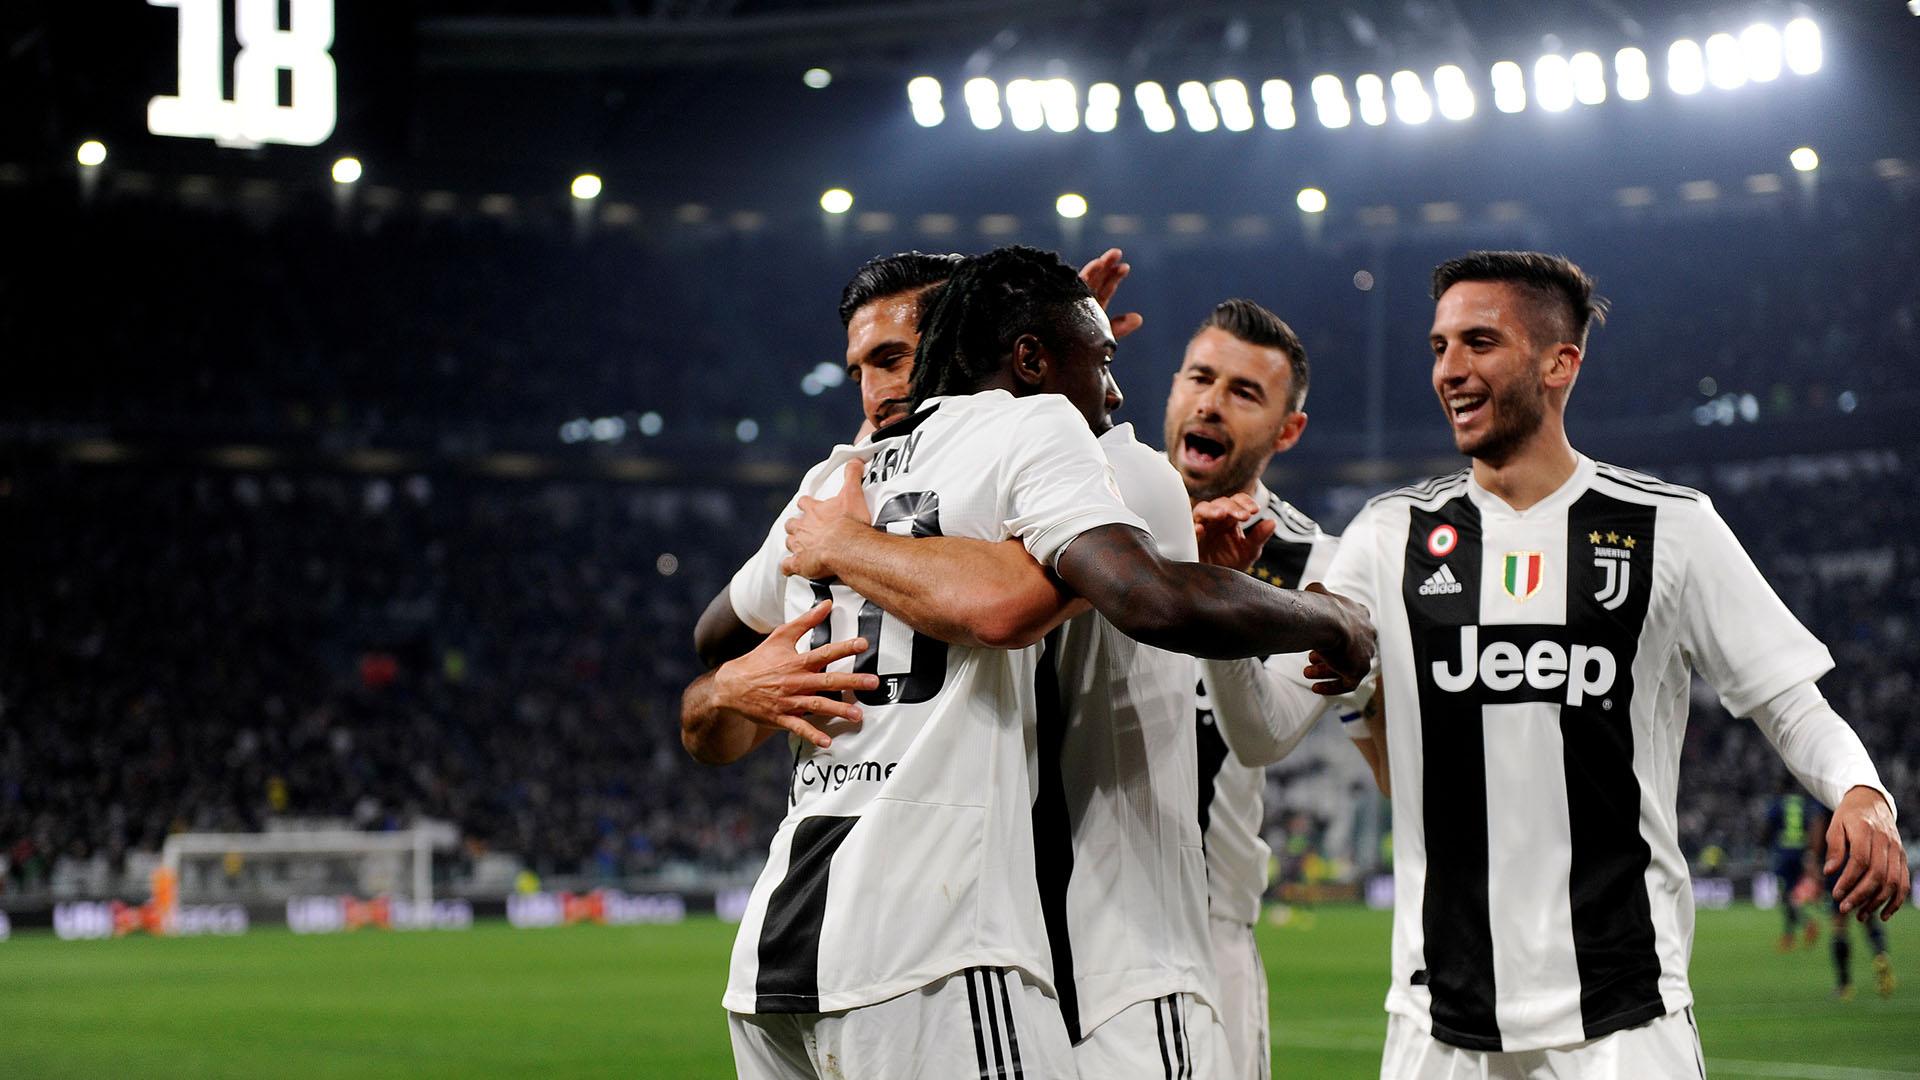 Juventus goleó al Udinese con un equipo alternativo y se encamina al  Scudetto - Infobae b6c0f9f592c71